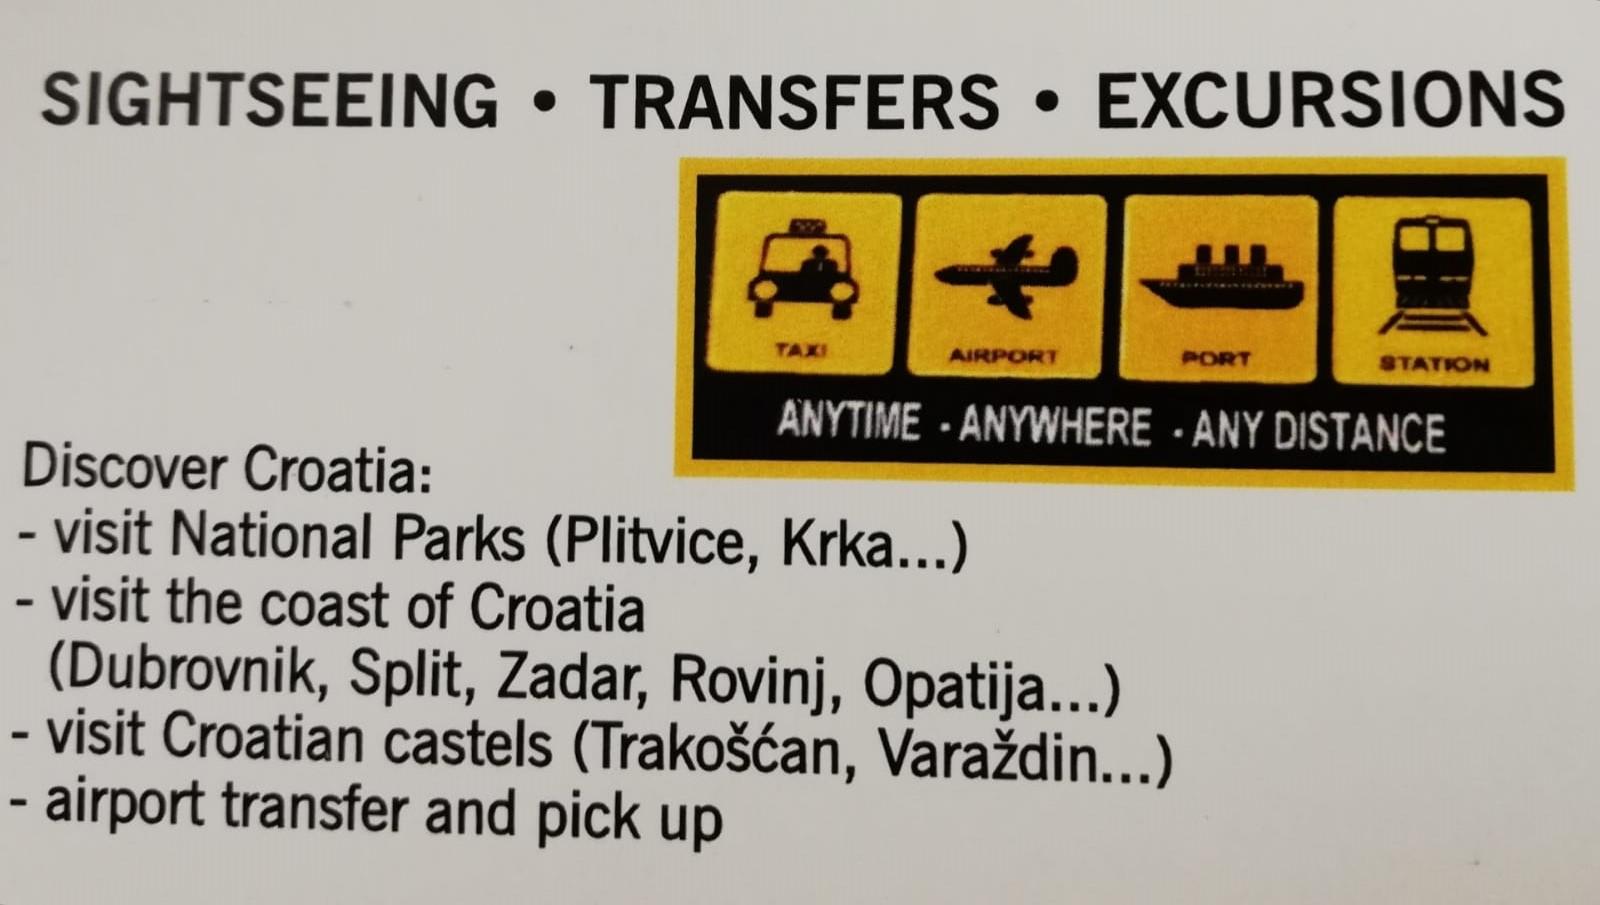 Airport transfers – Metropola Taxi